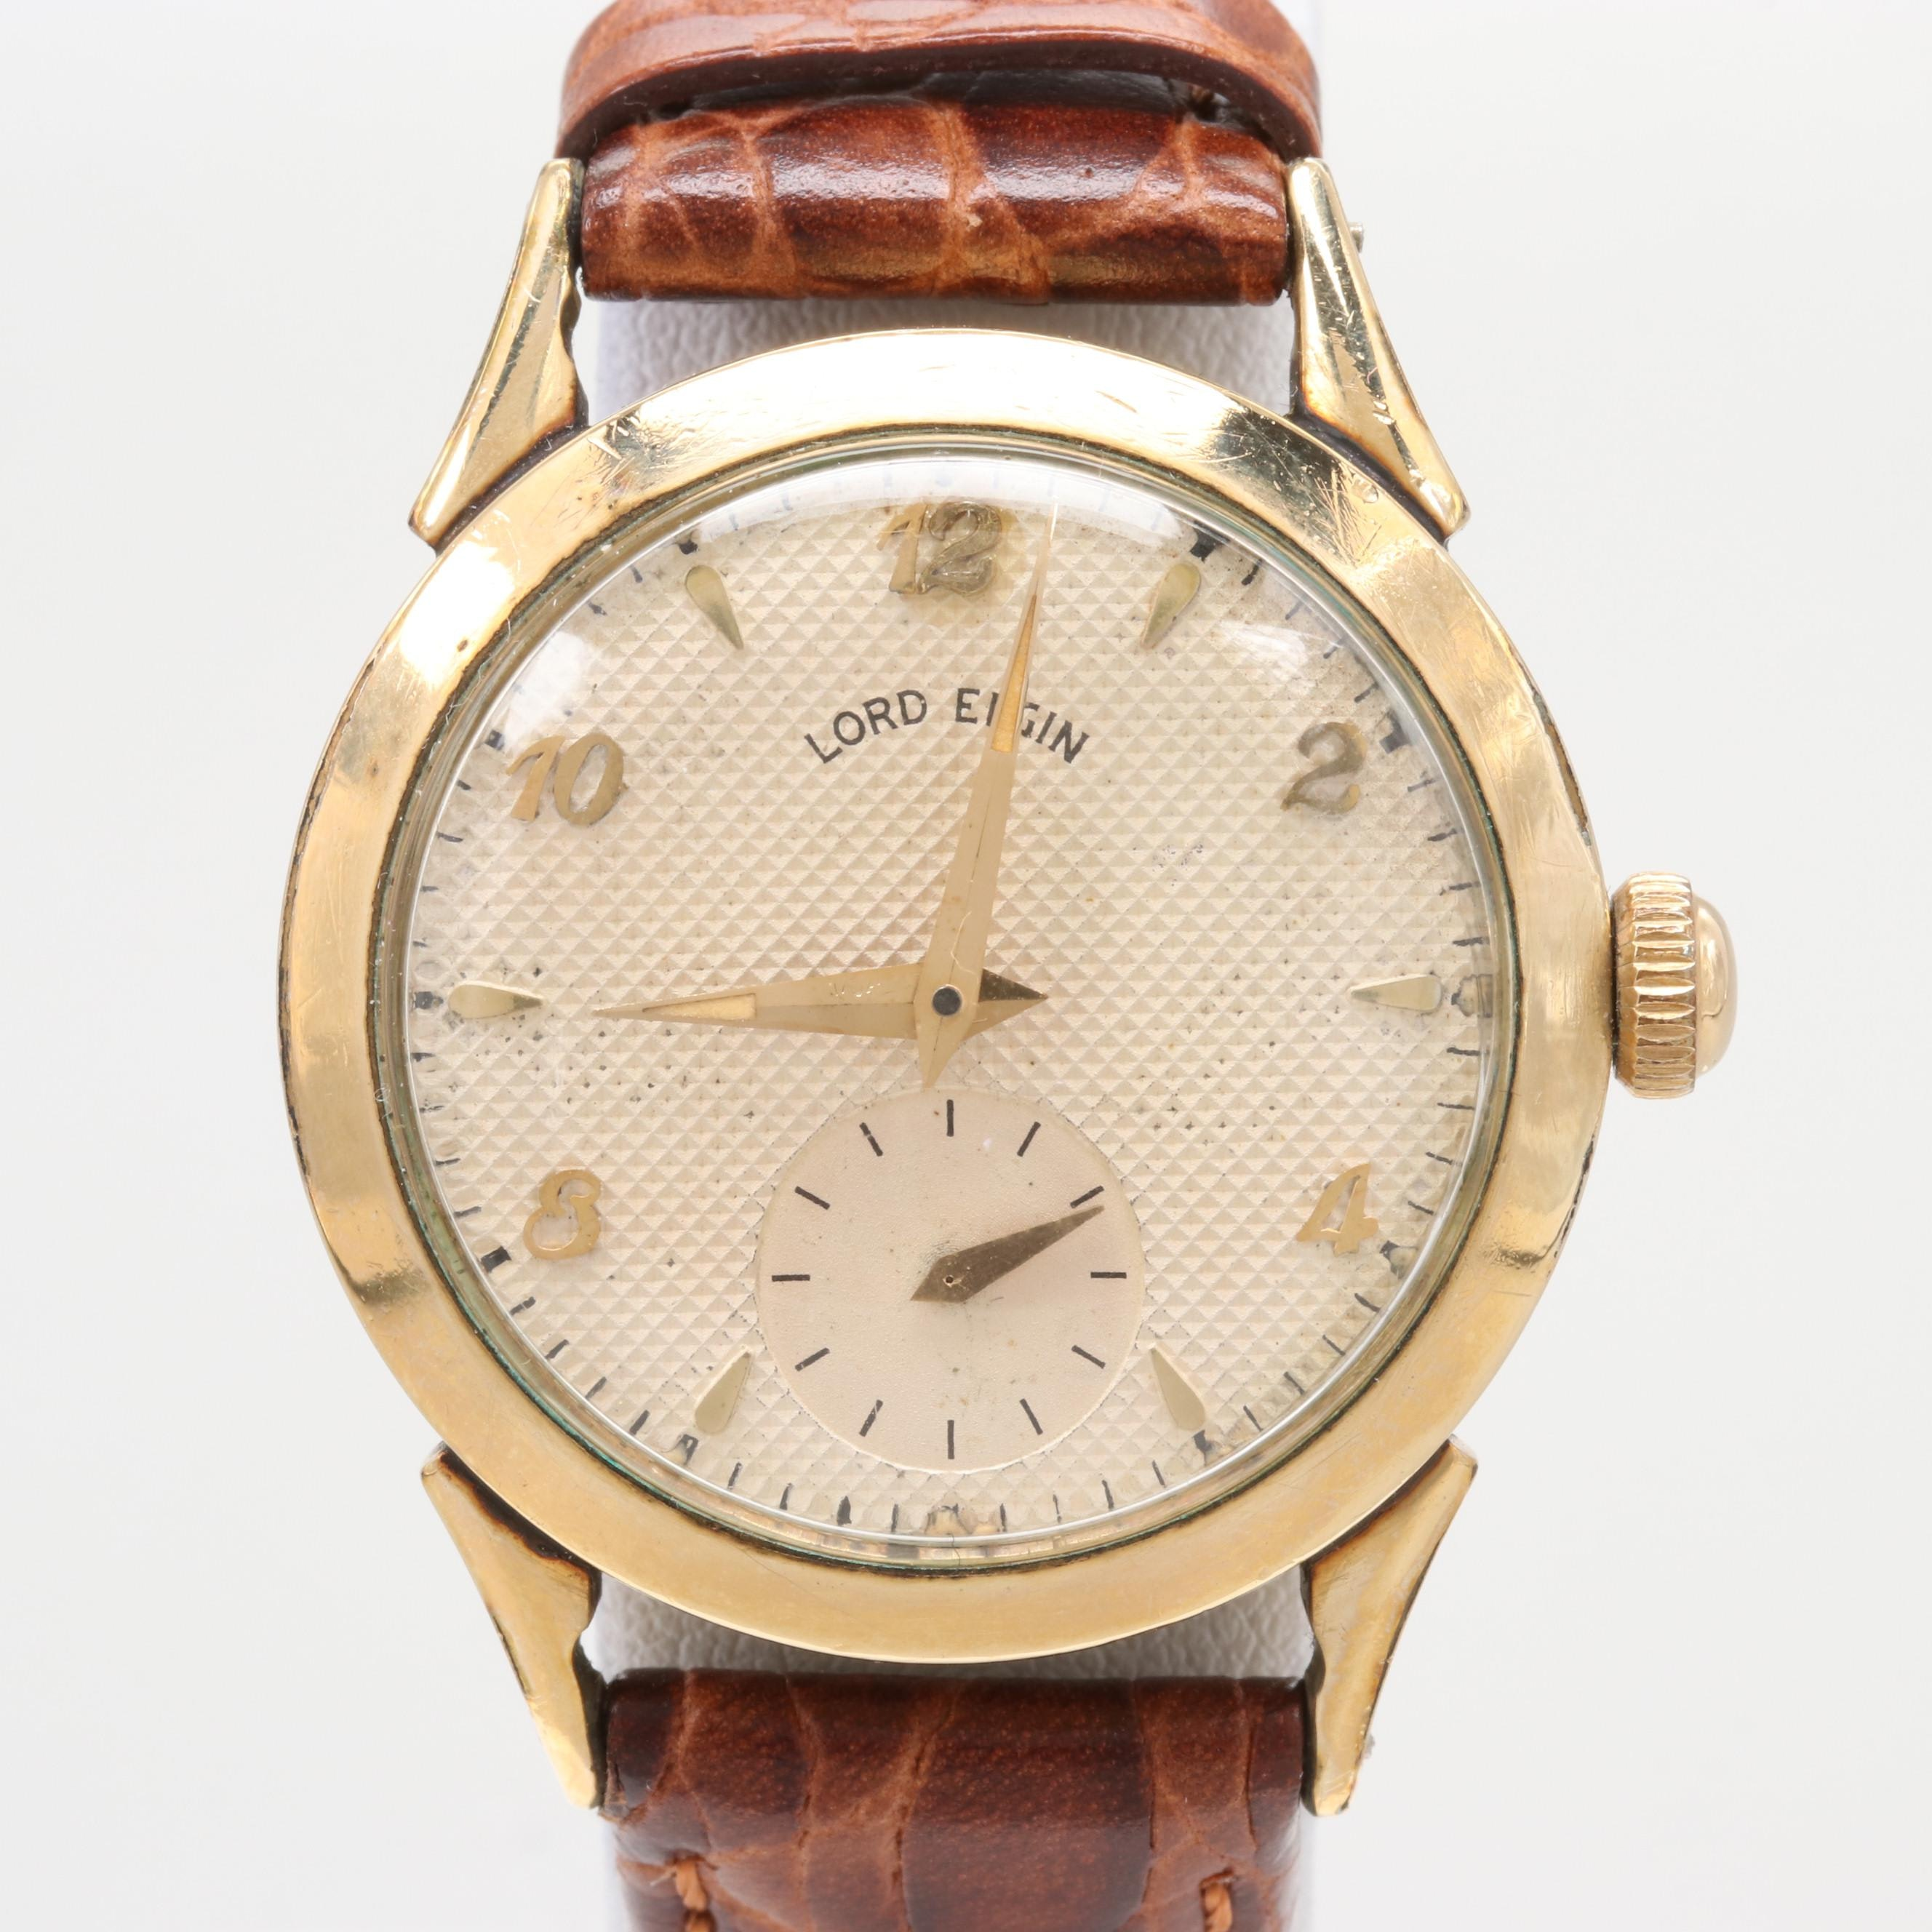 Lord Elgin 14K Gold Filled Wristwatch